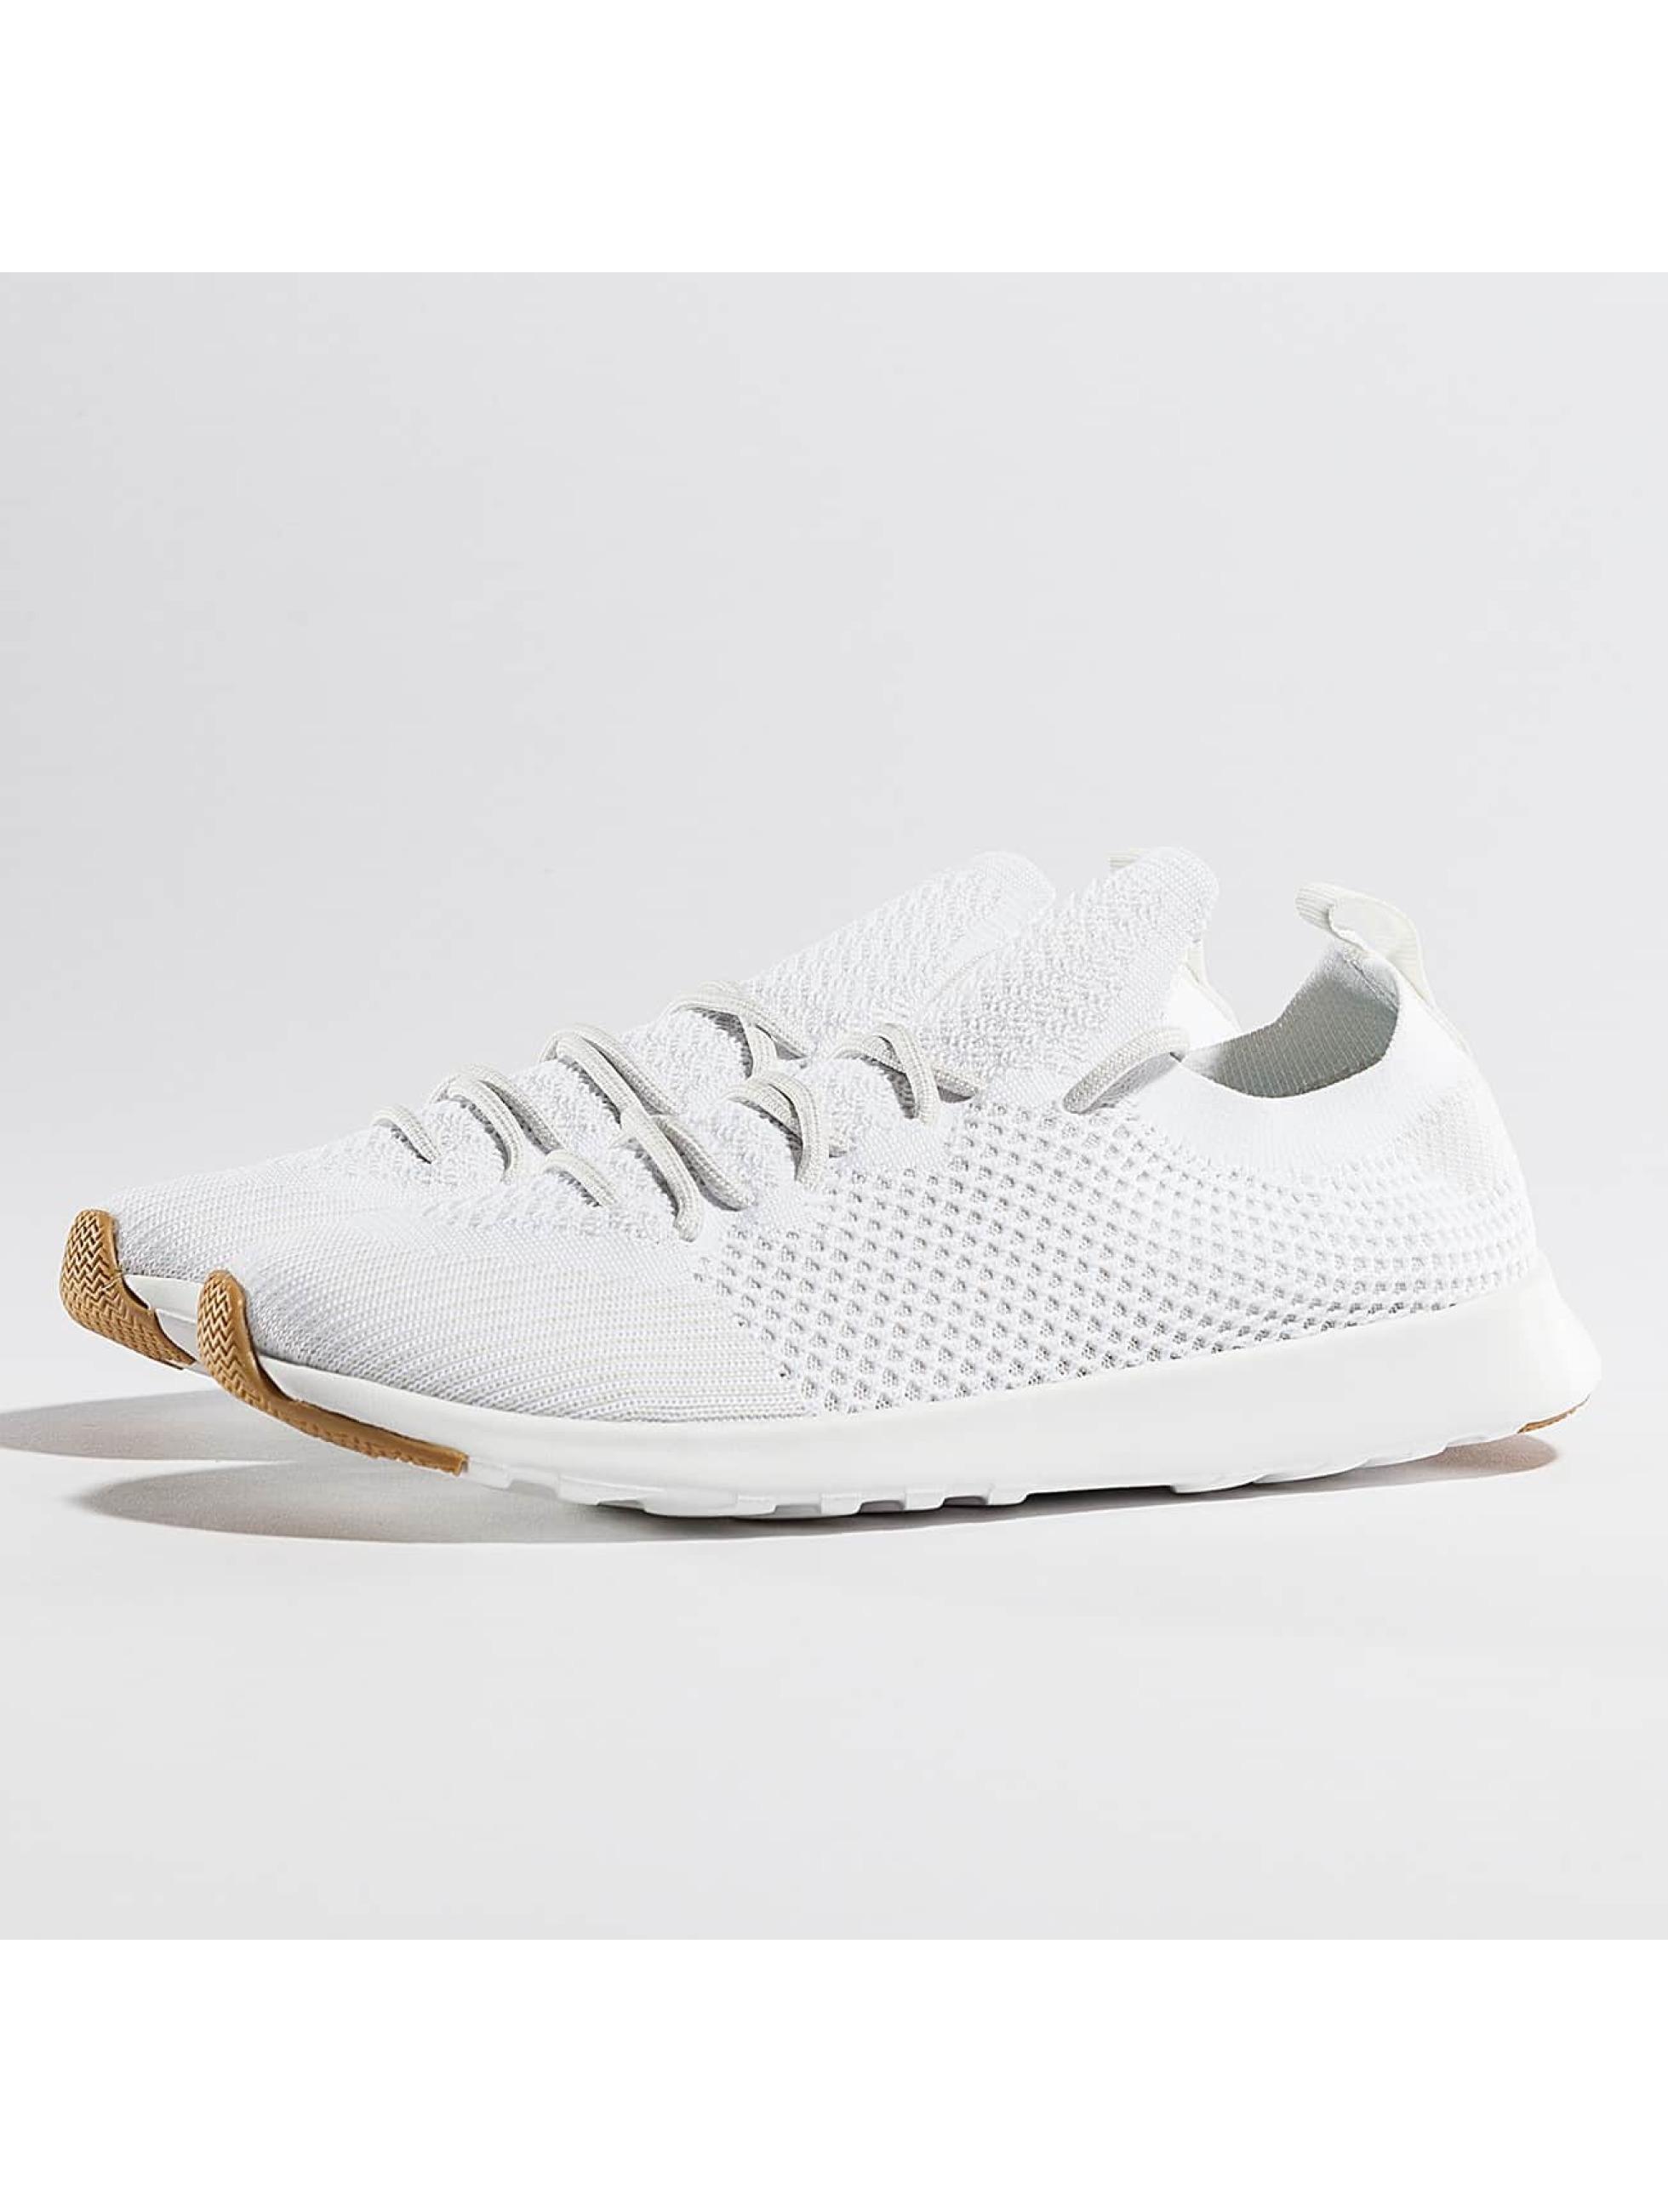 Native Chaussures / Baskets AP Mercury LiteKnit en blanc